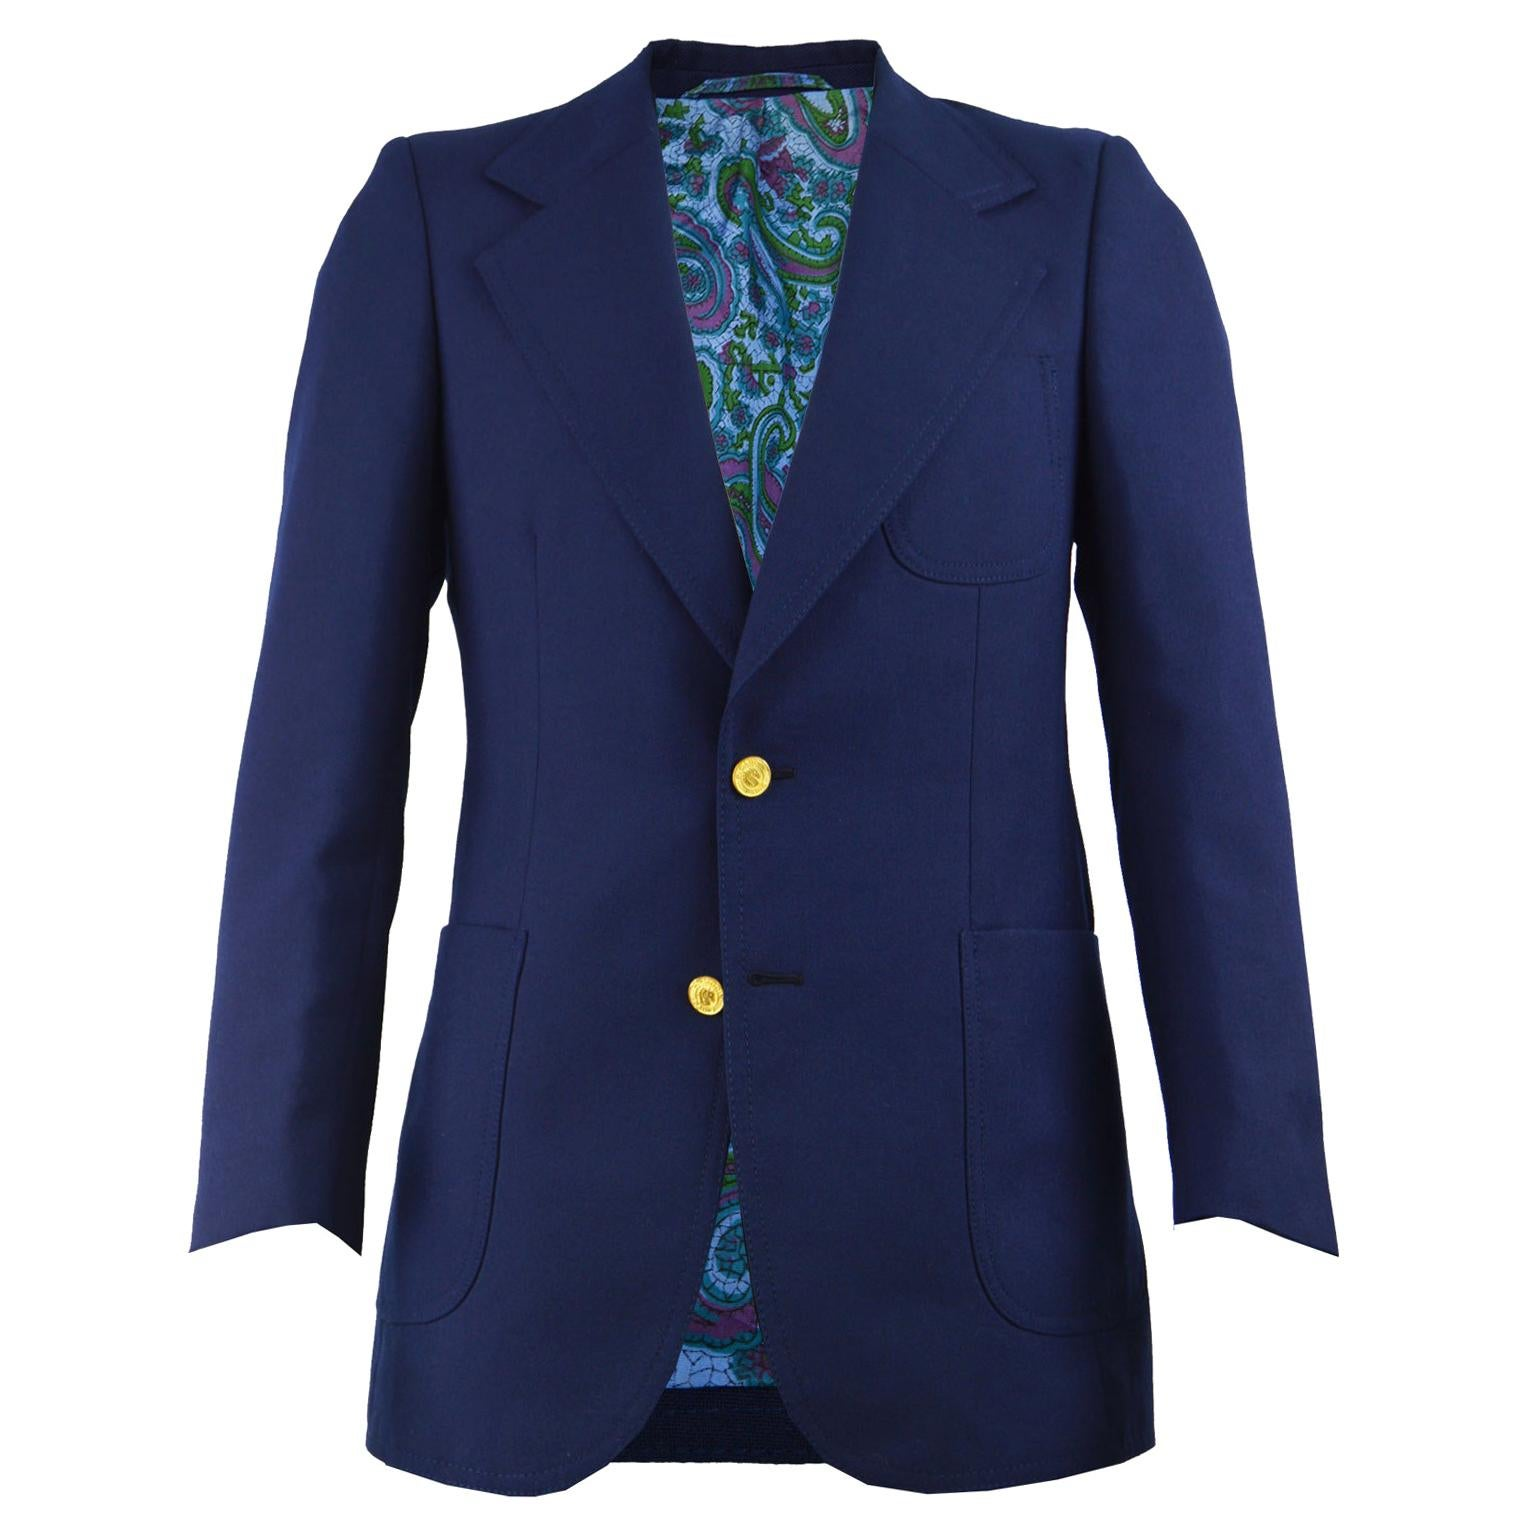 Men/'s Pierre Cardin Suit Brown 1950/'s Vintage Style Wool Blend